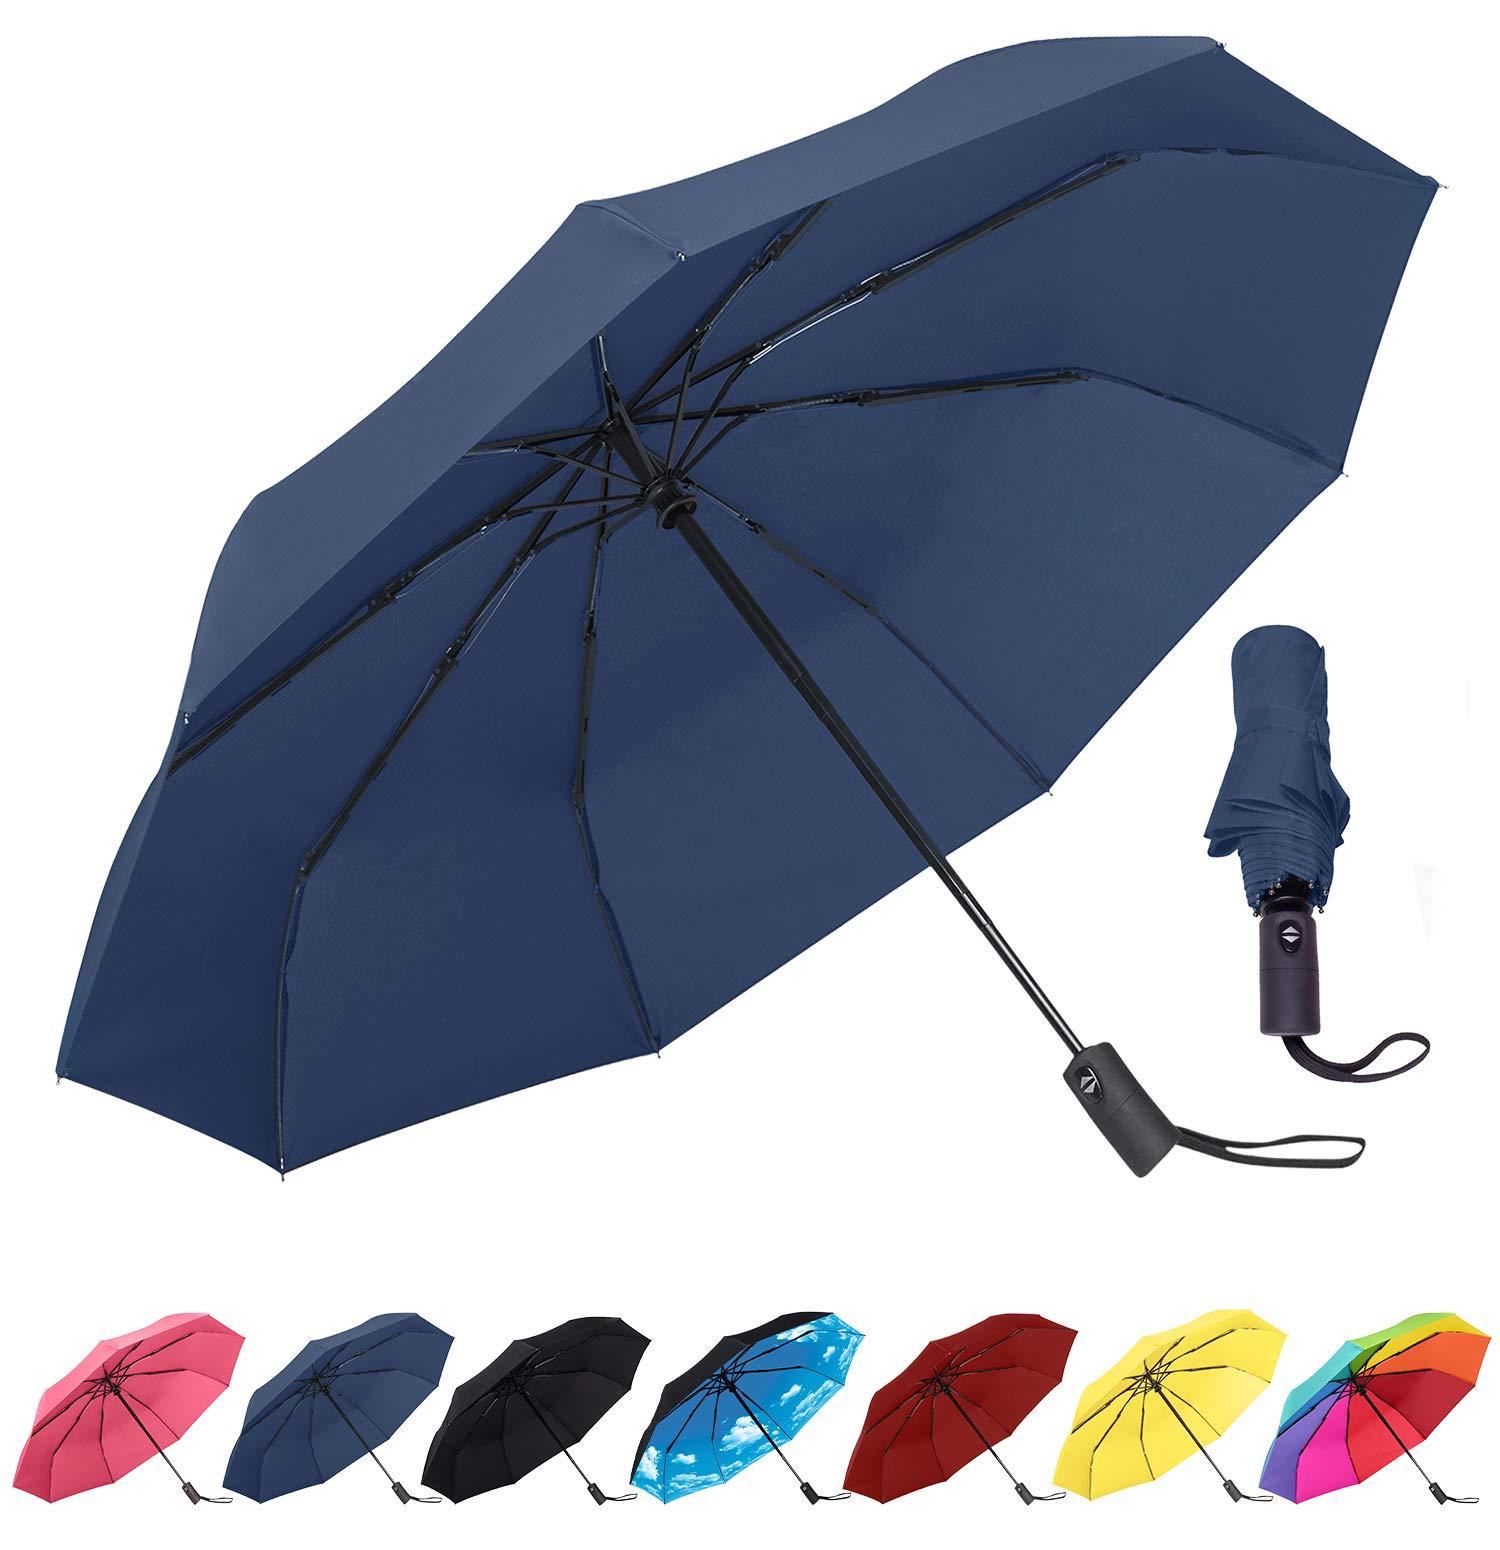 Rain Mate Compact Travel Umbrella Reinforced